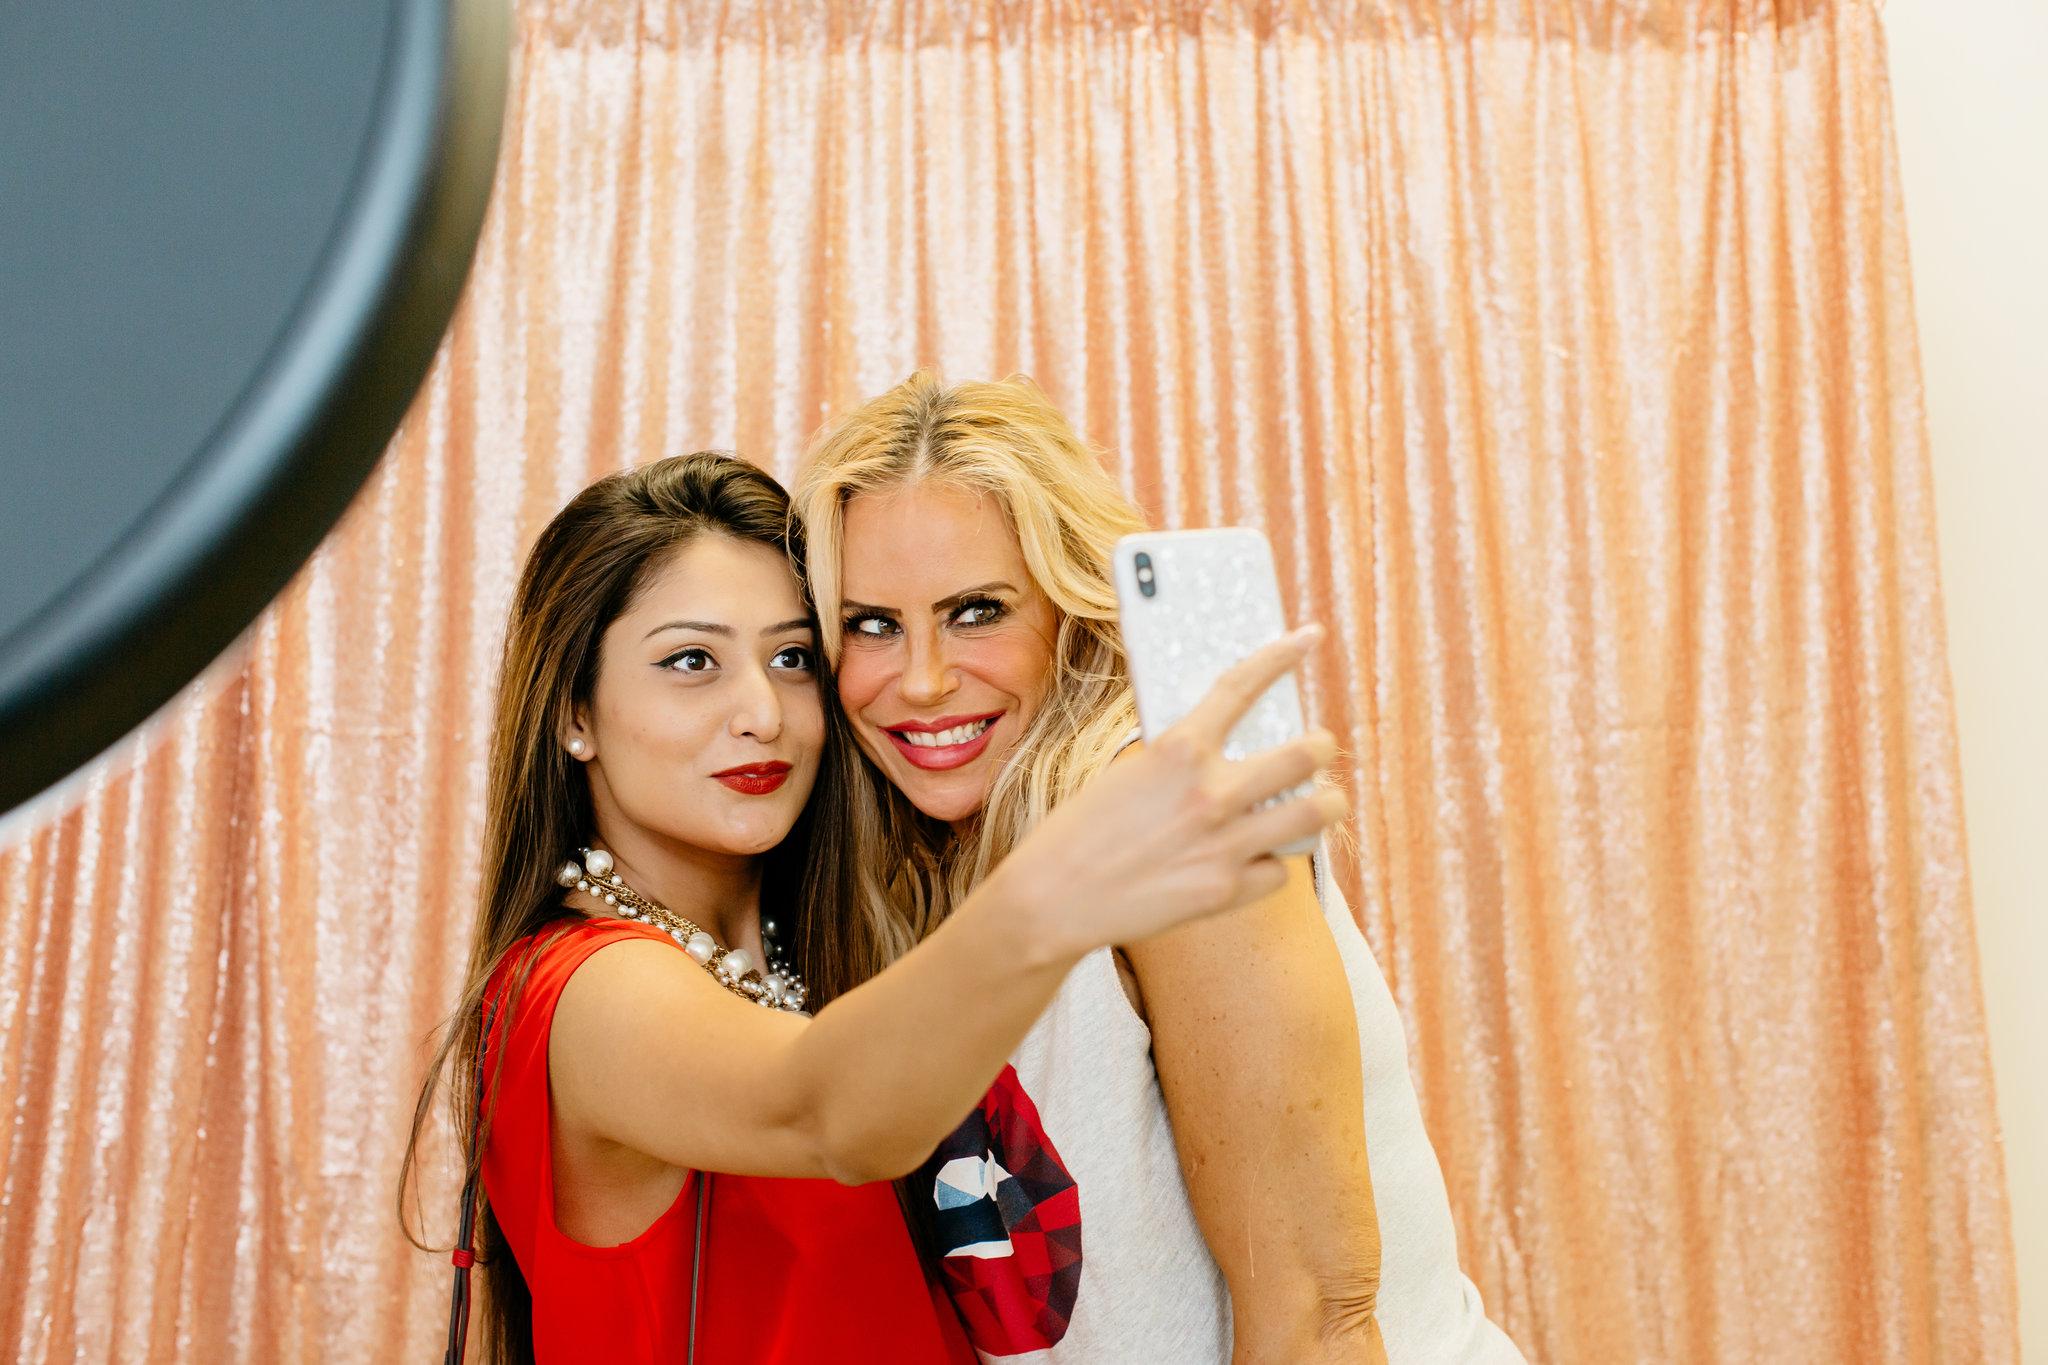 Alexa-Vossler-Photo_Dallas-Event-Photographer_Brite-Bar-Beauty-2018-Lipstick-Launch-Party-54.jpg